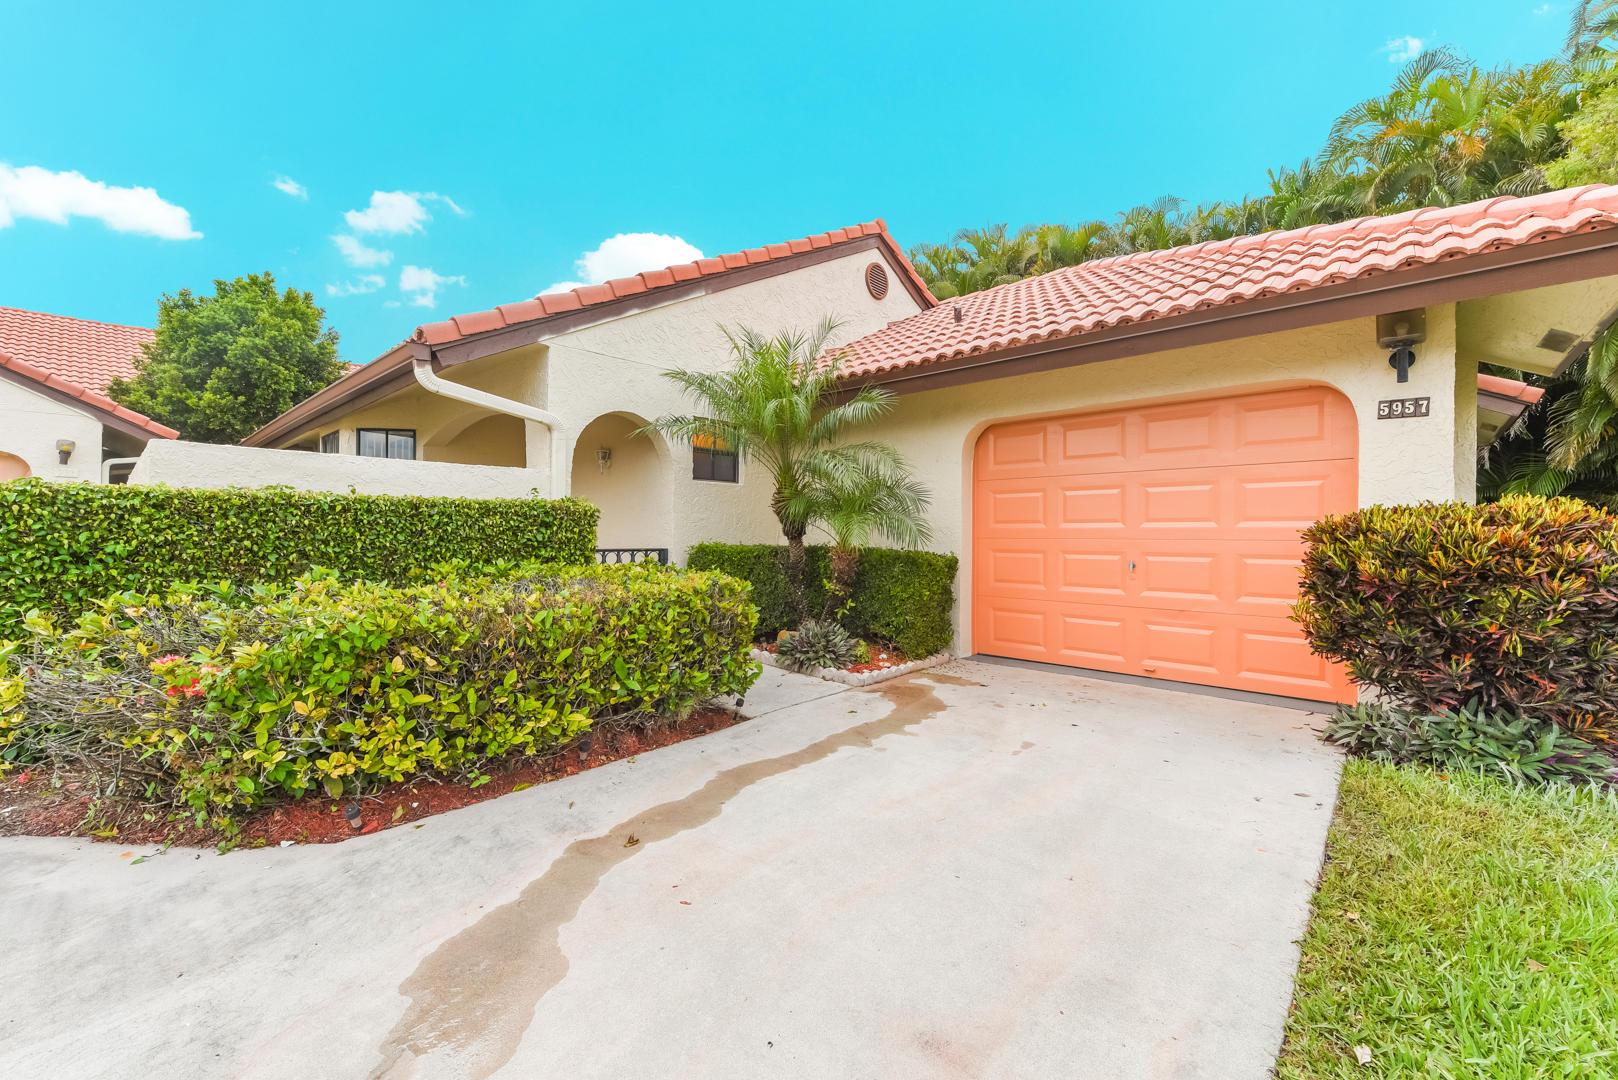 5957 Parkwalk Drive 916 Boynton Beach, FL 33472